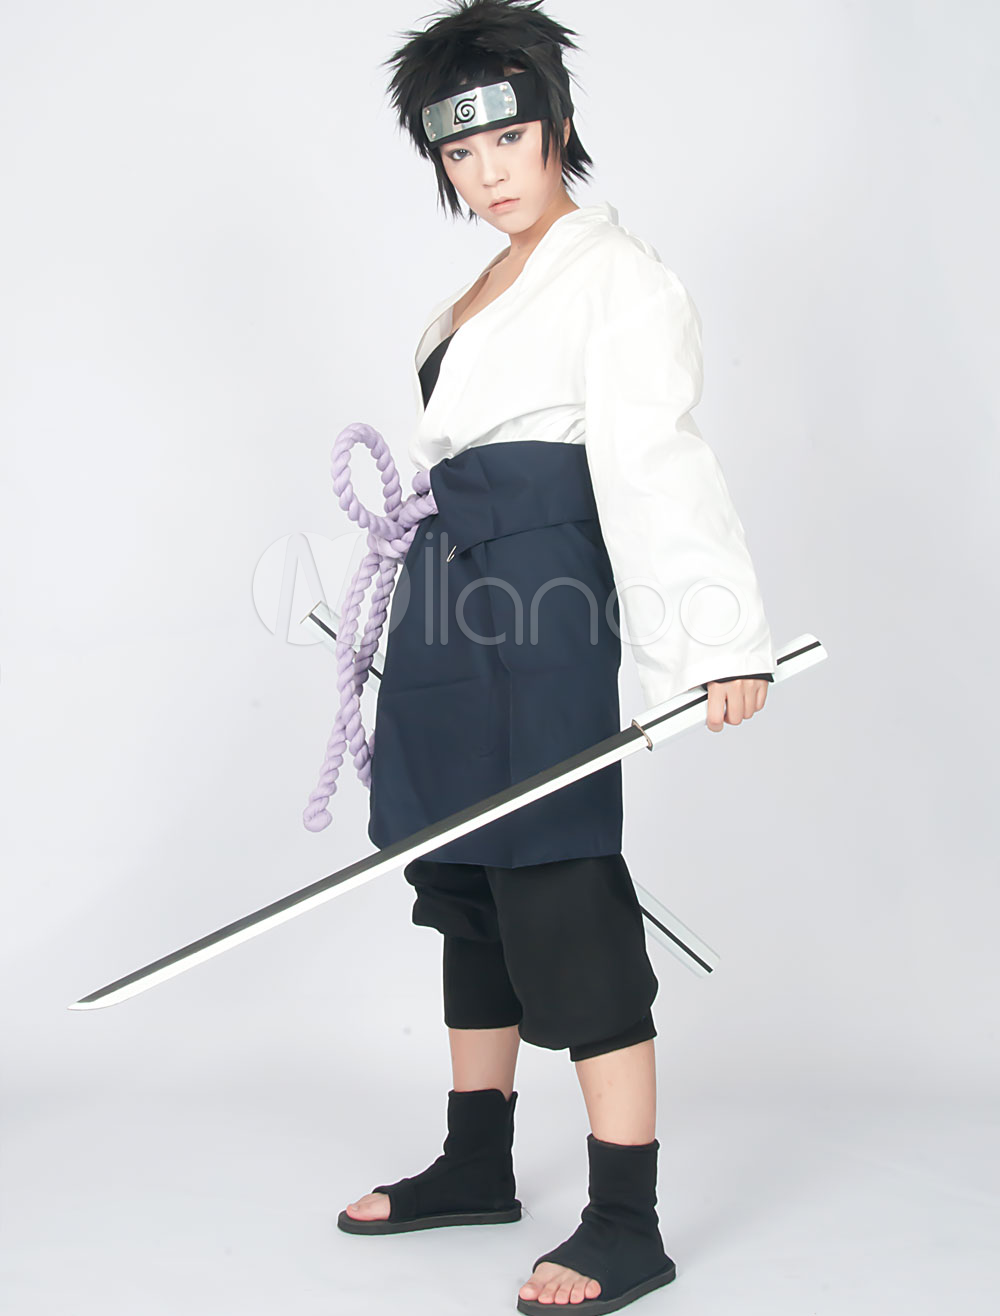 Les cosplay ! - Page 3 Naruto-Uchiha-Sasuke-Cosplay-Costume-6753-0